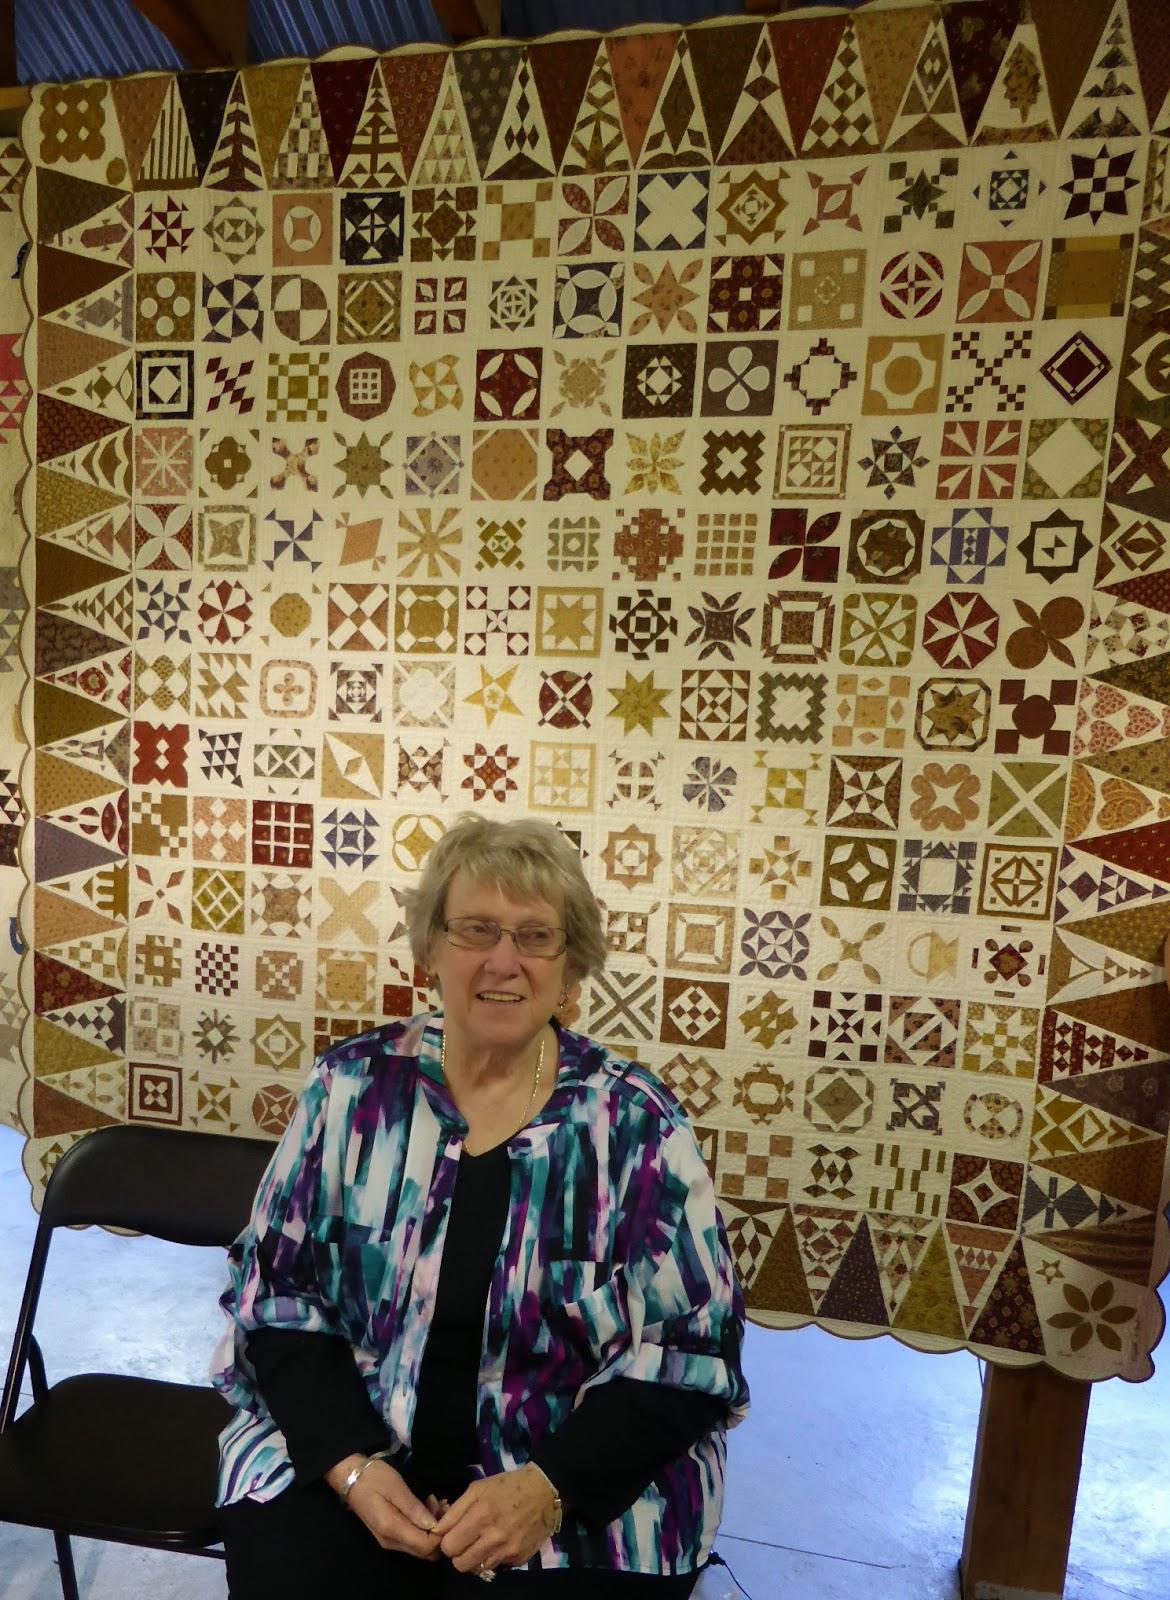 Brenda Papadakis Dear Jane Quilt Quilts in the Barn